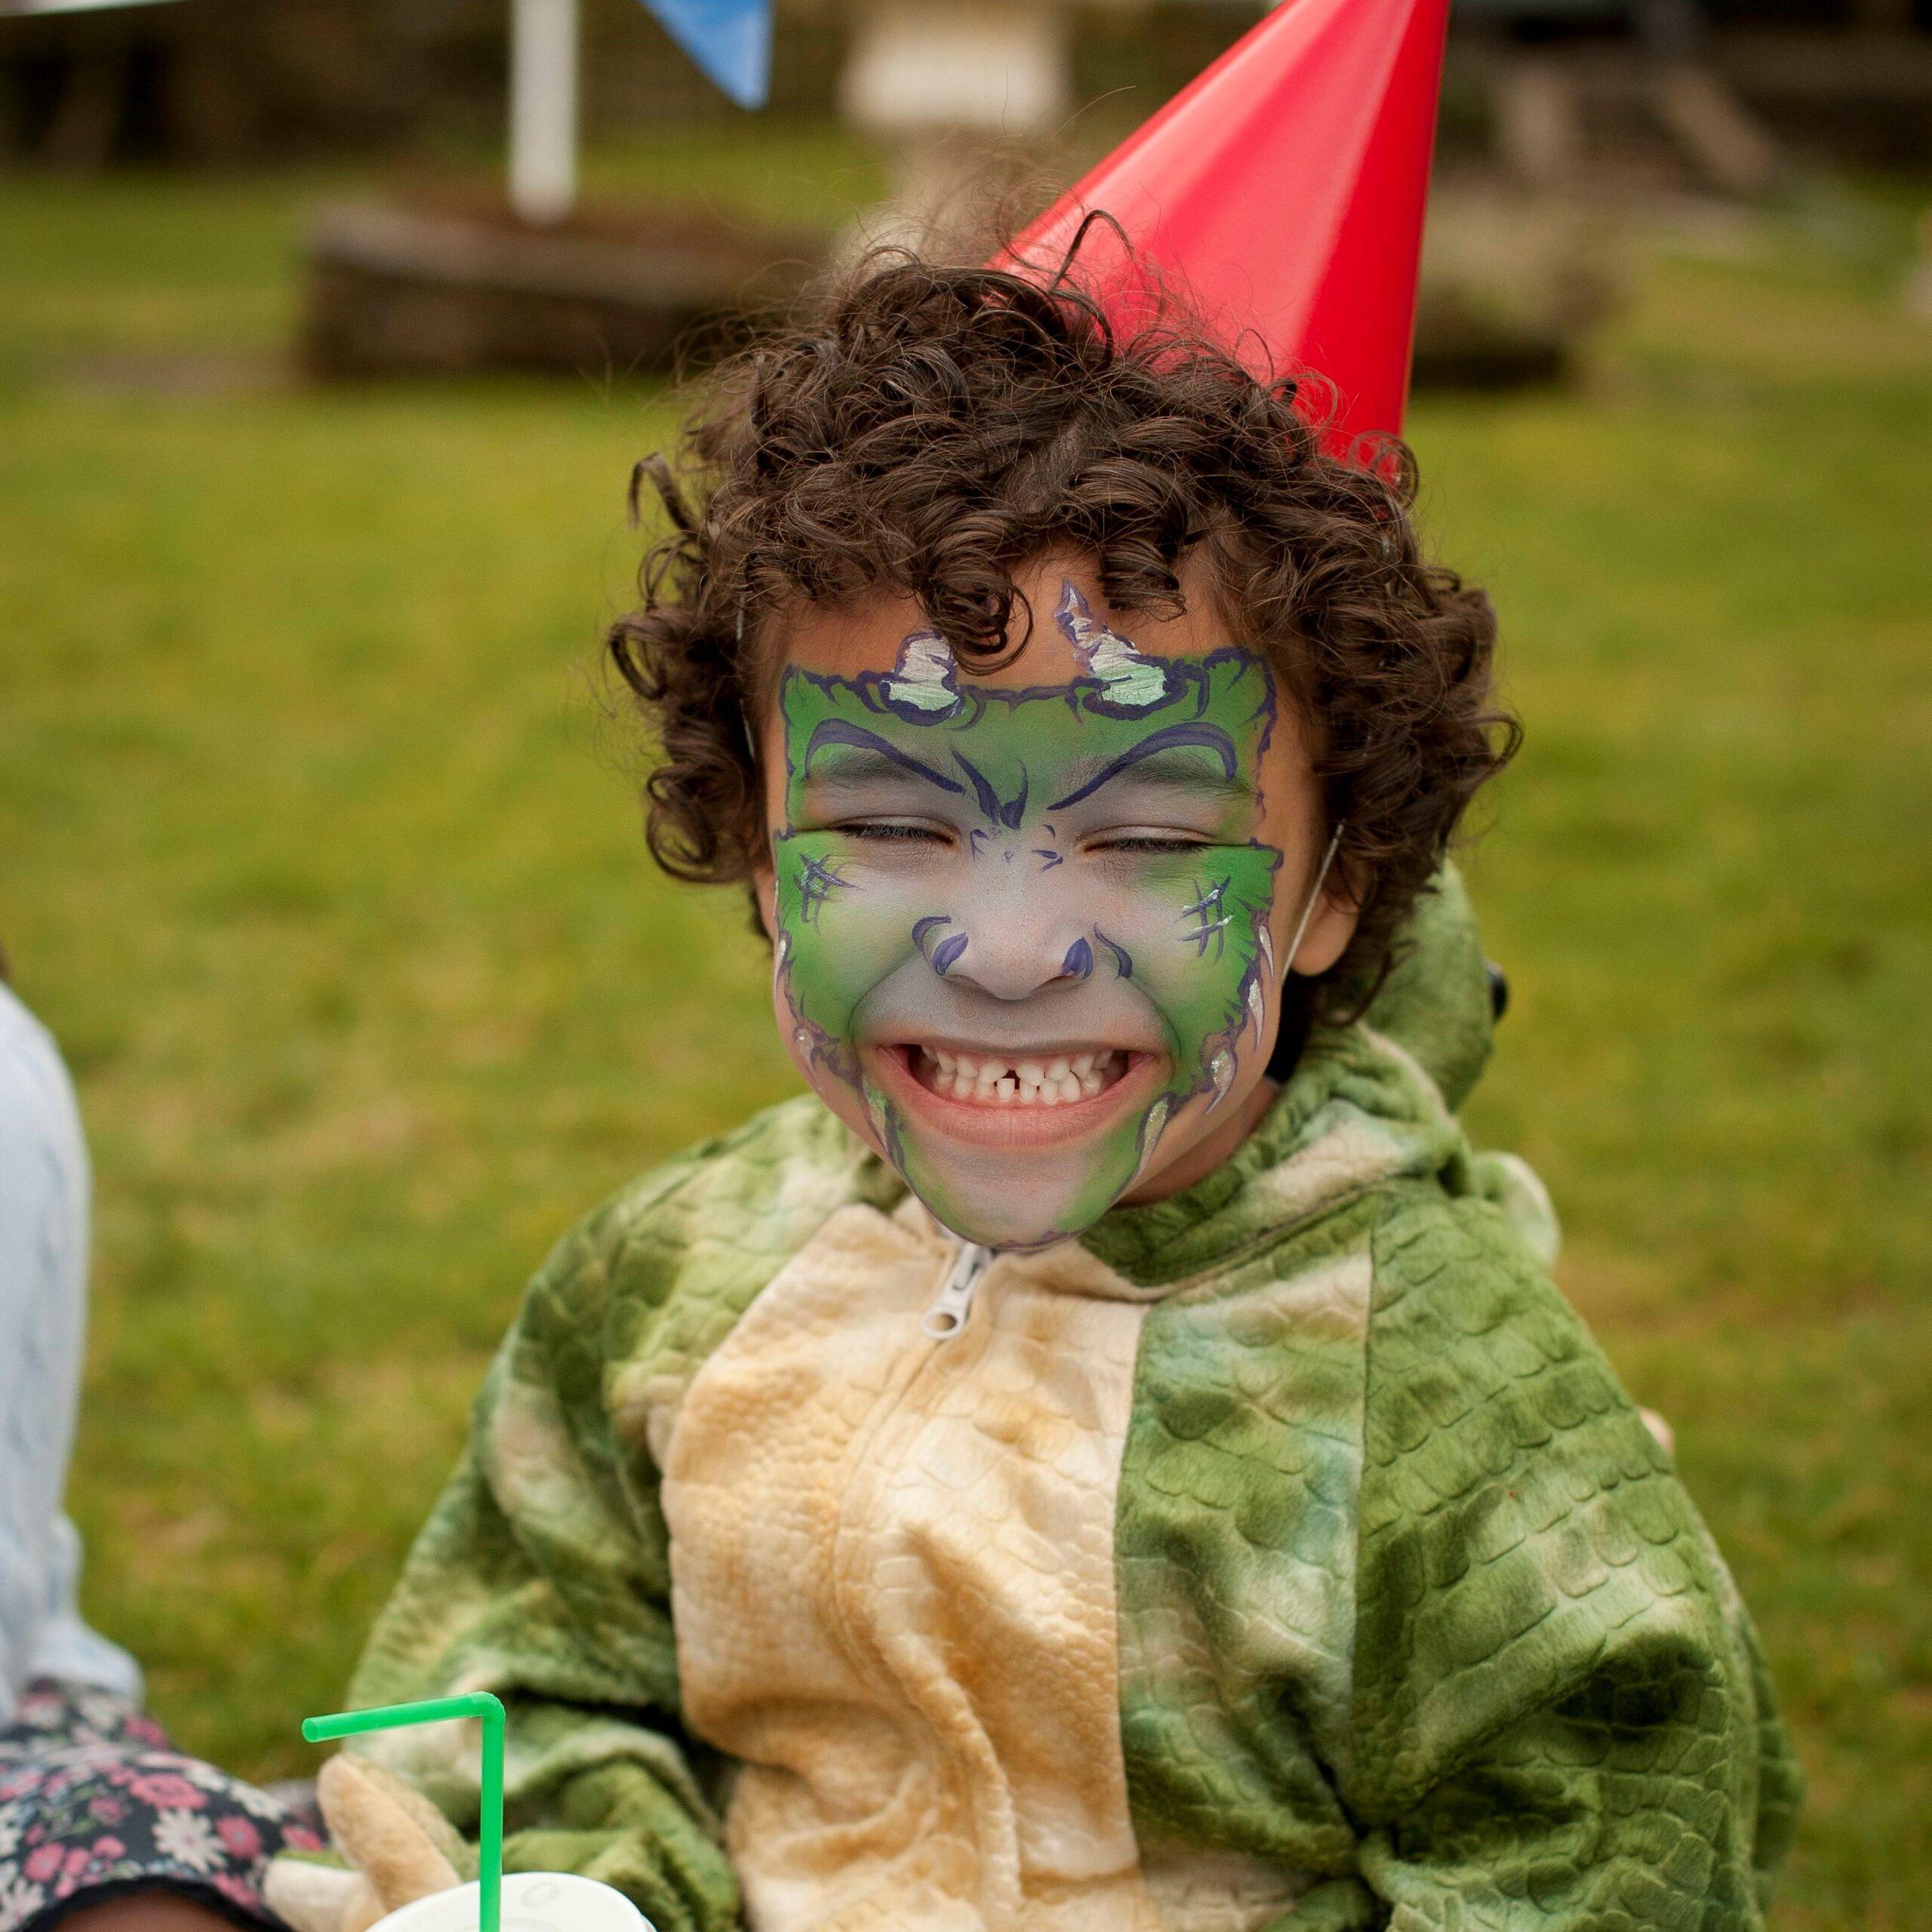 Boy with Snazaroo Dinosaur Face Paint at Birthday Party